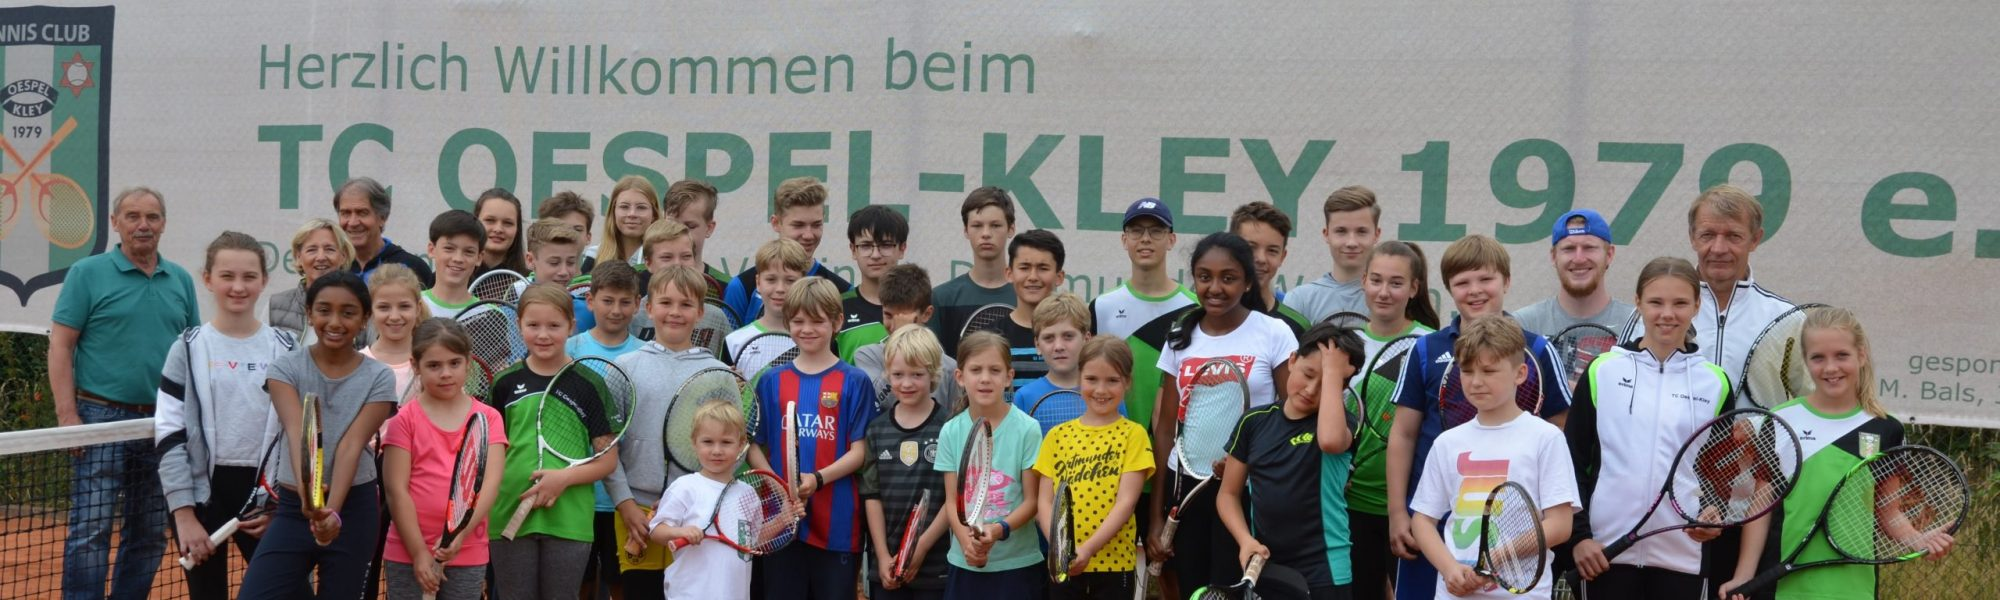 TC Oespel-Kley1979eV